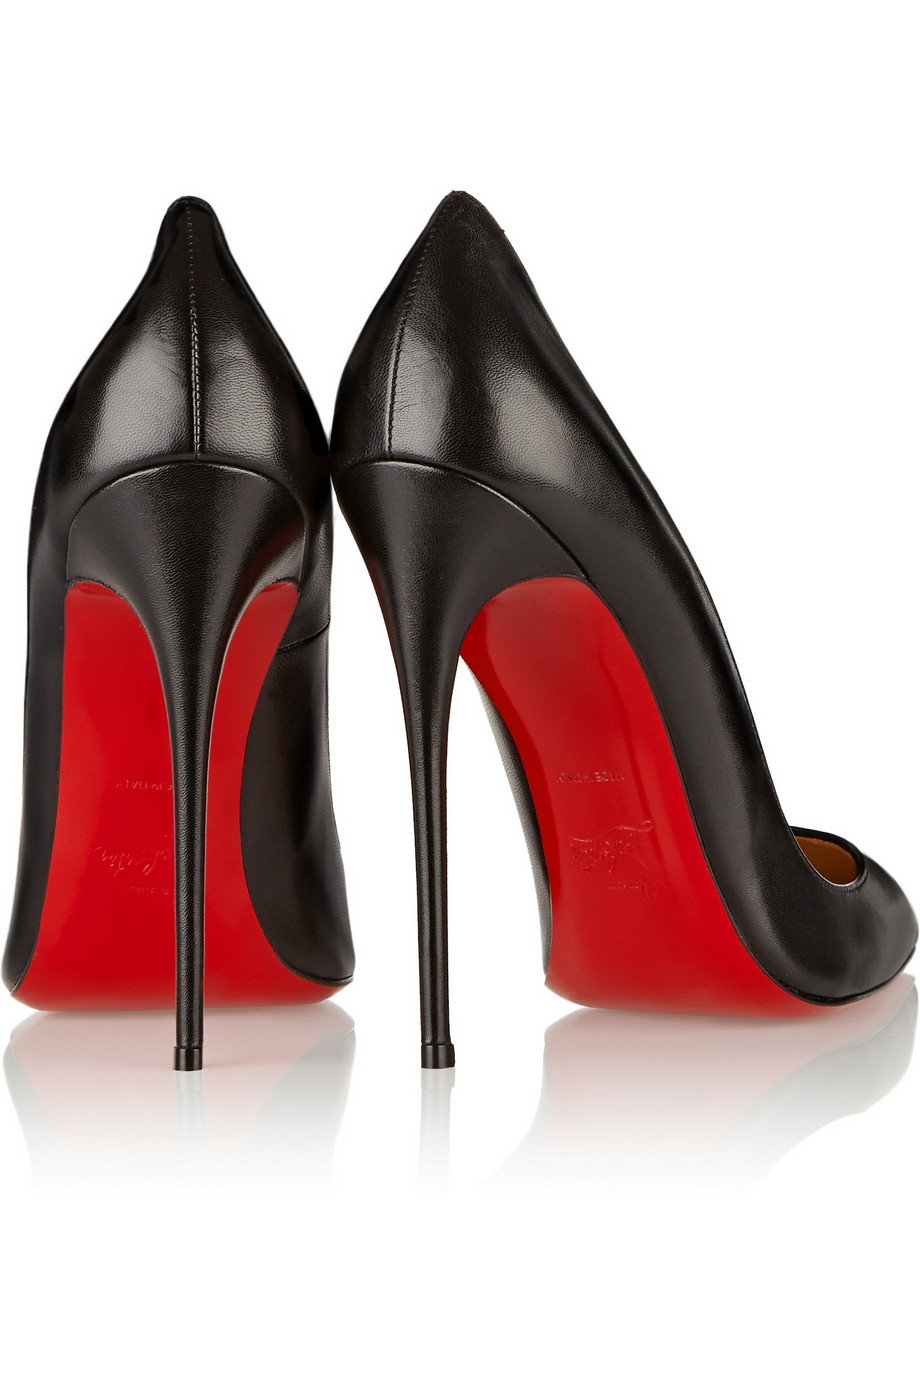 Pumps Heels Shoes Louboutin